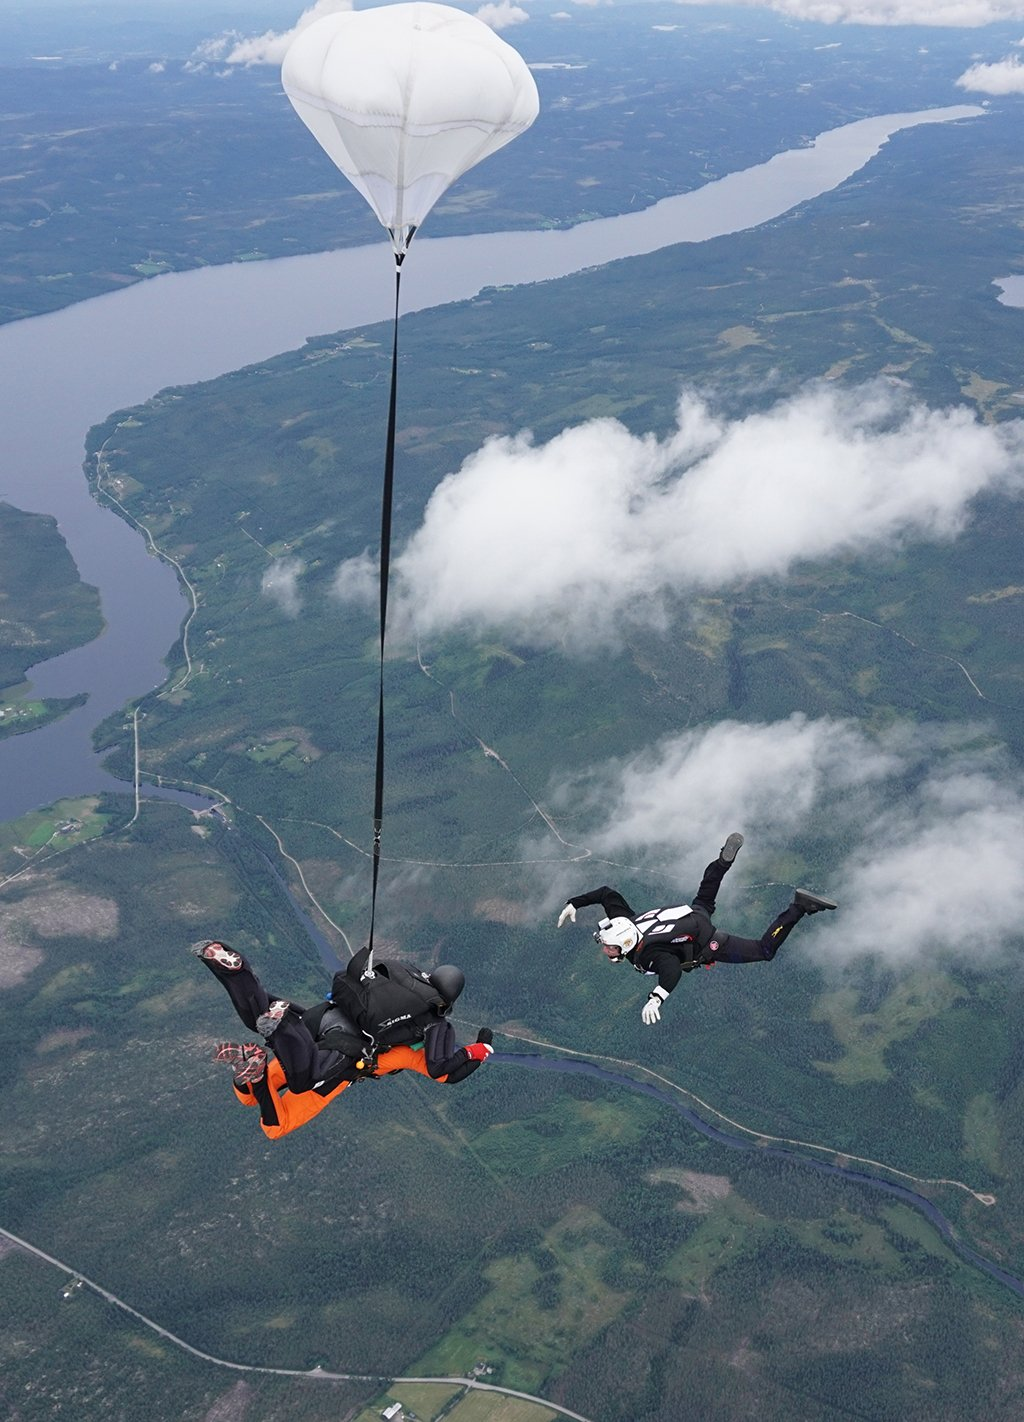 Tandem fallskjerm